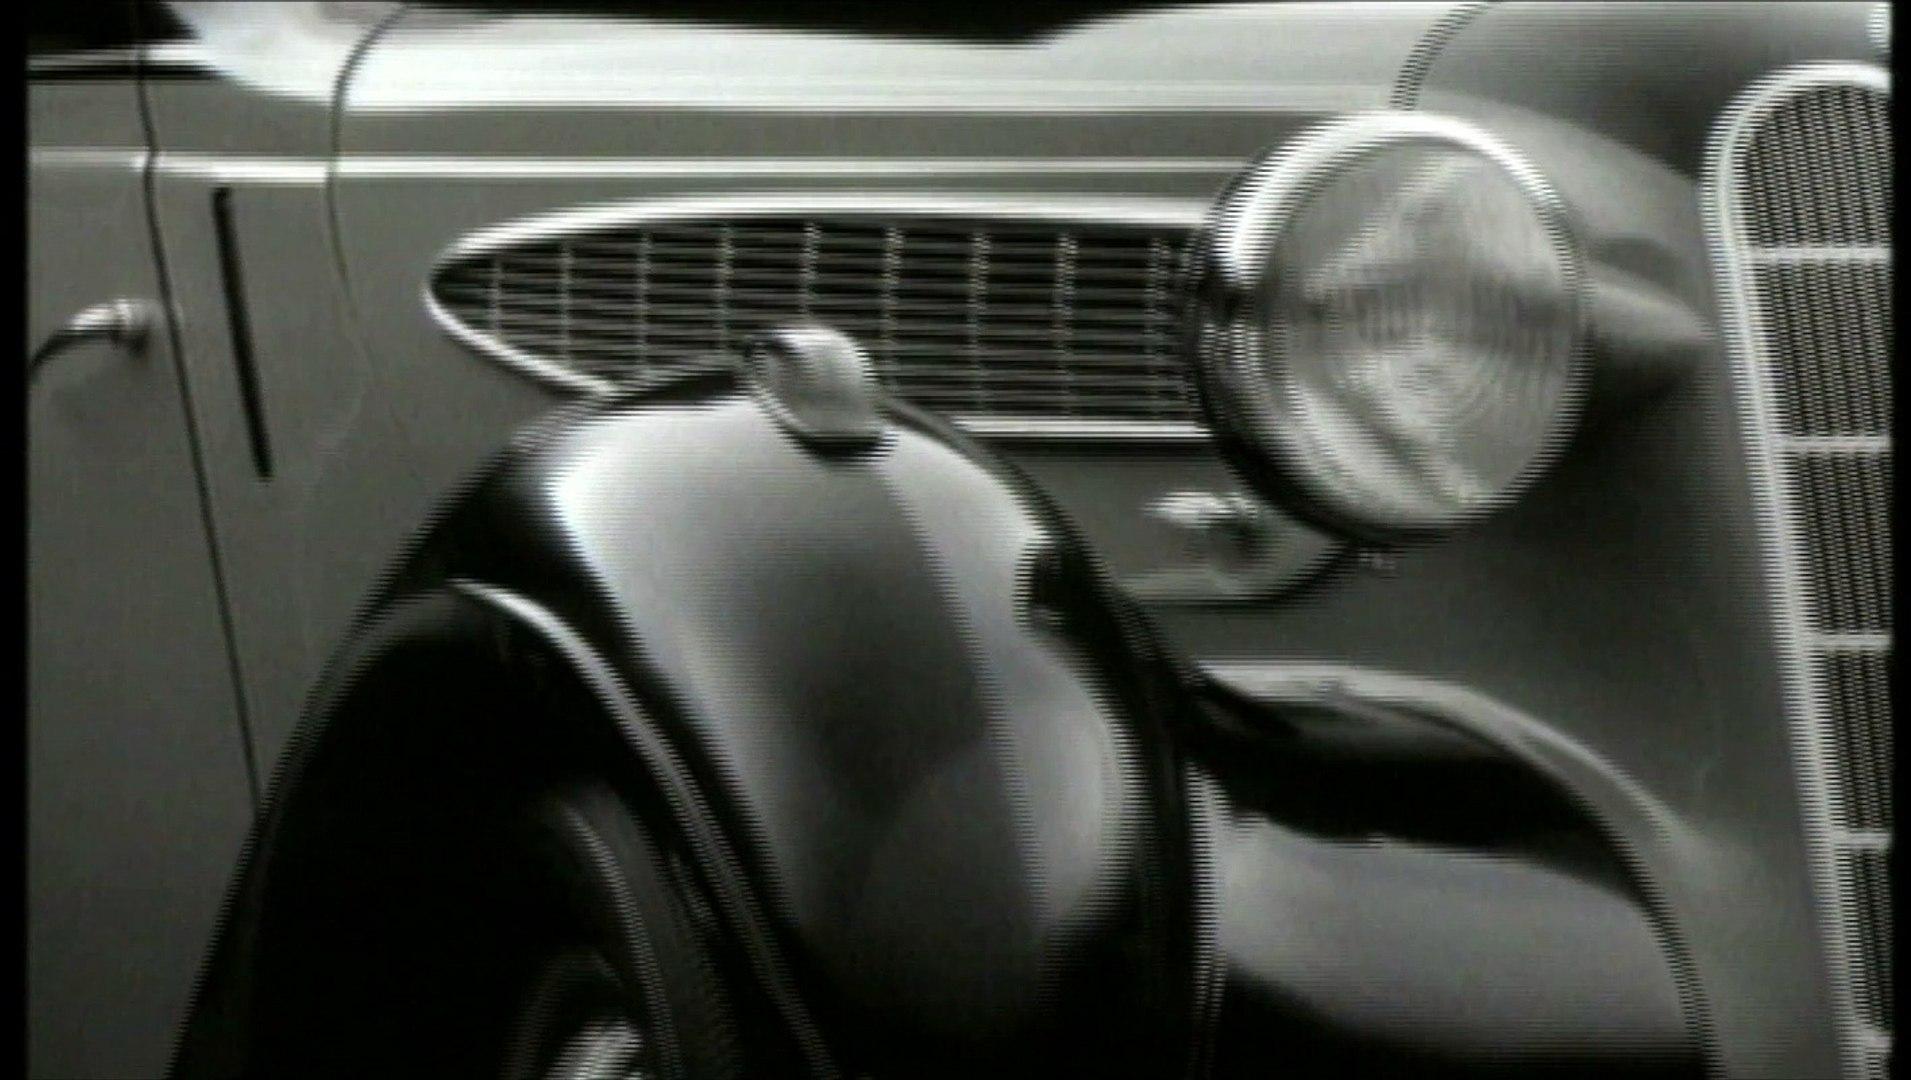 Evolution en morphing de la calandre BMW jusqu'en 2005